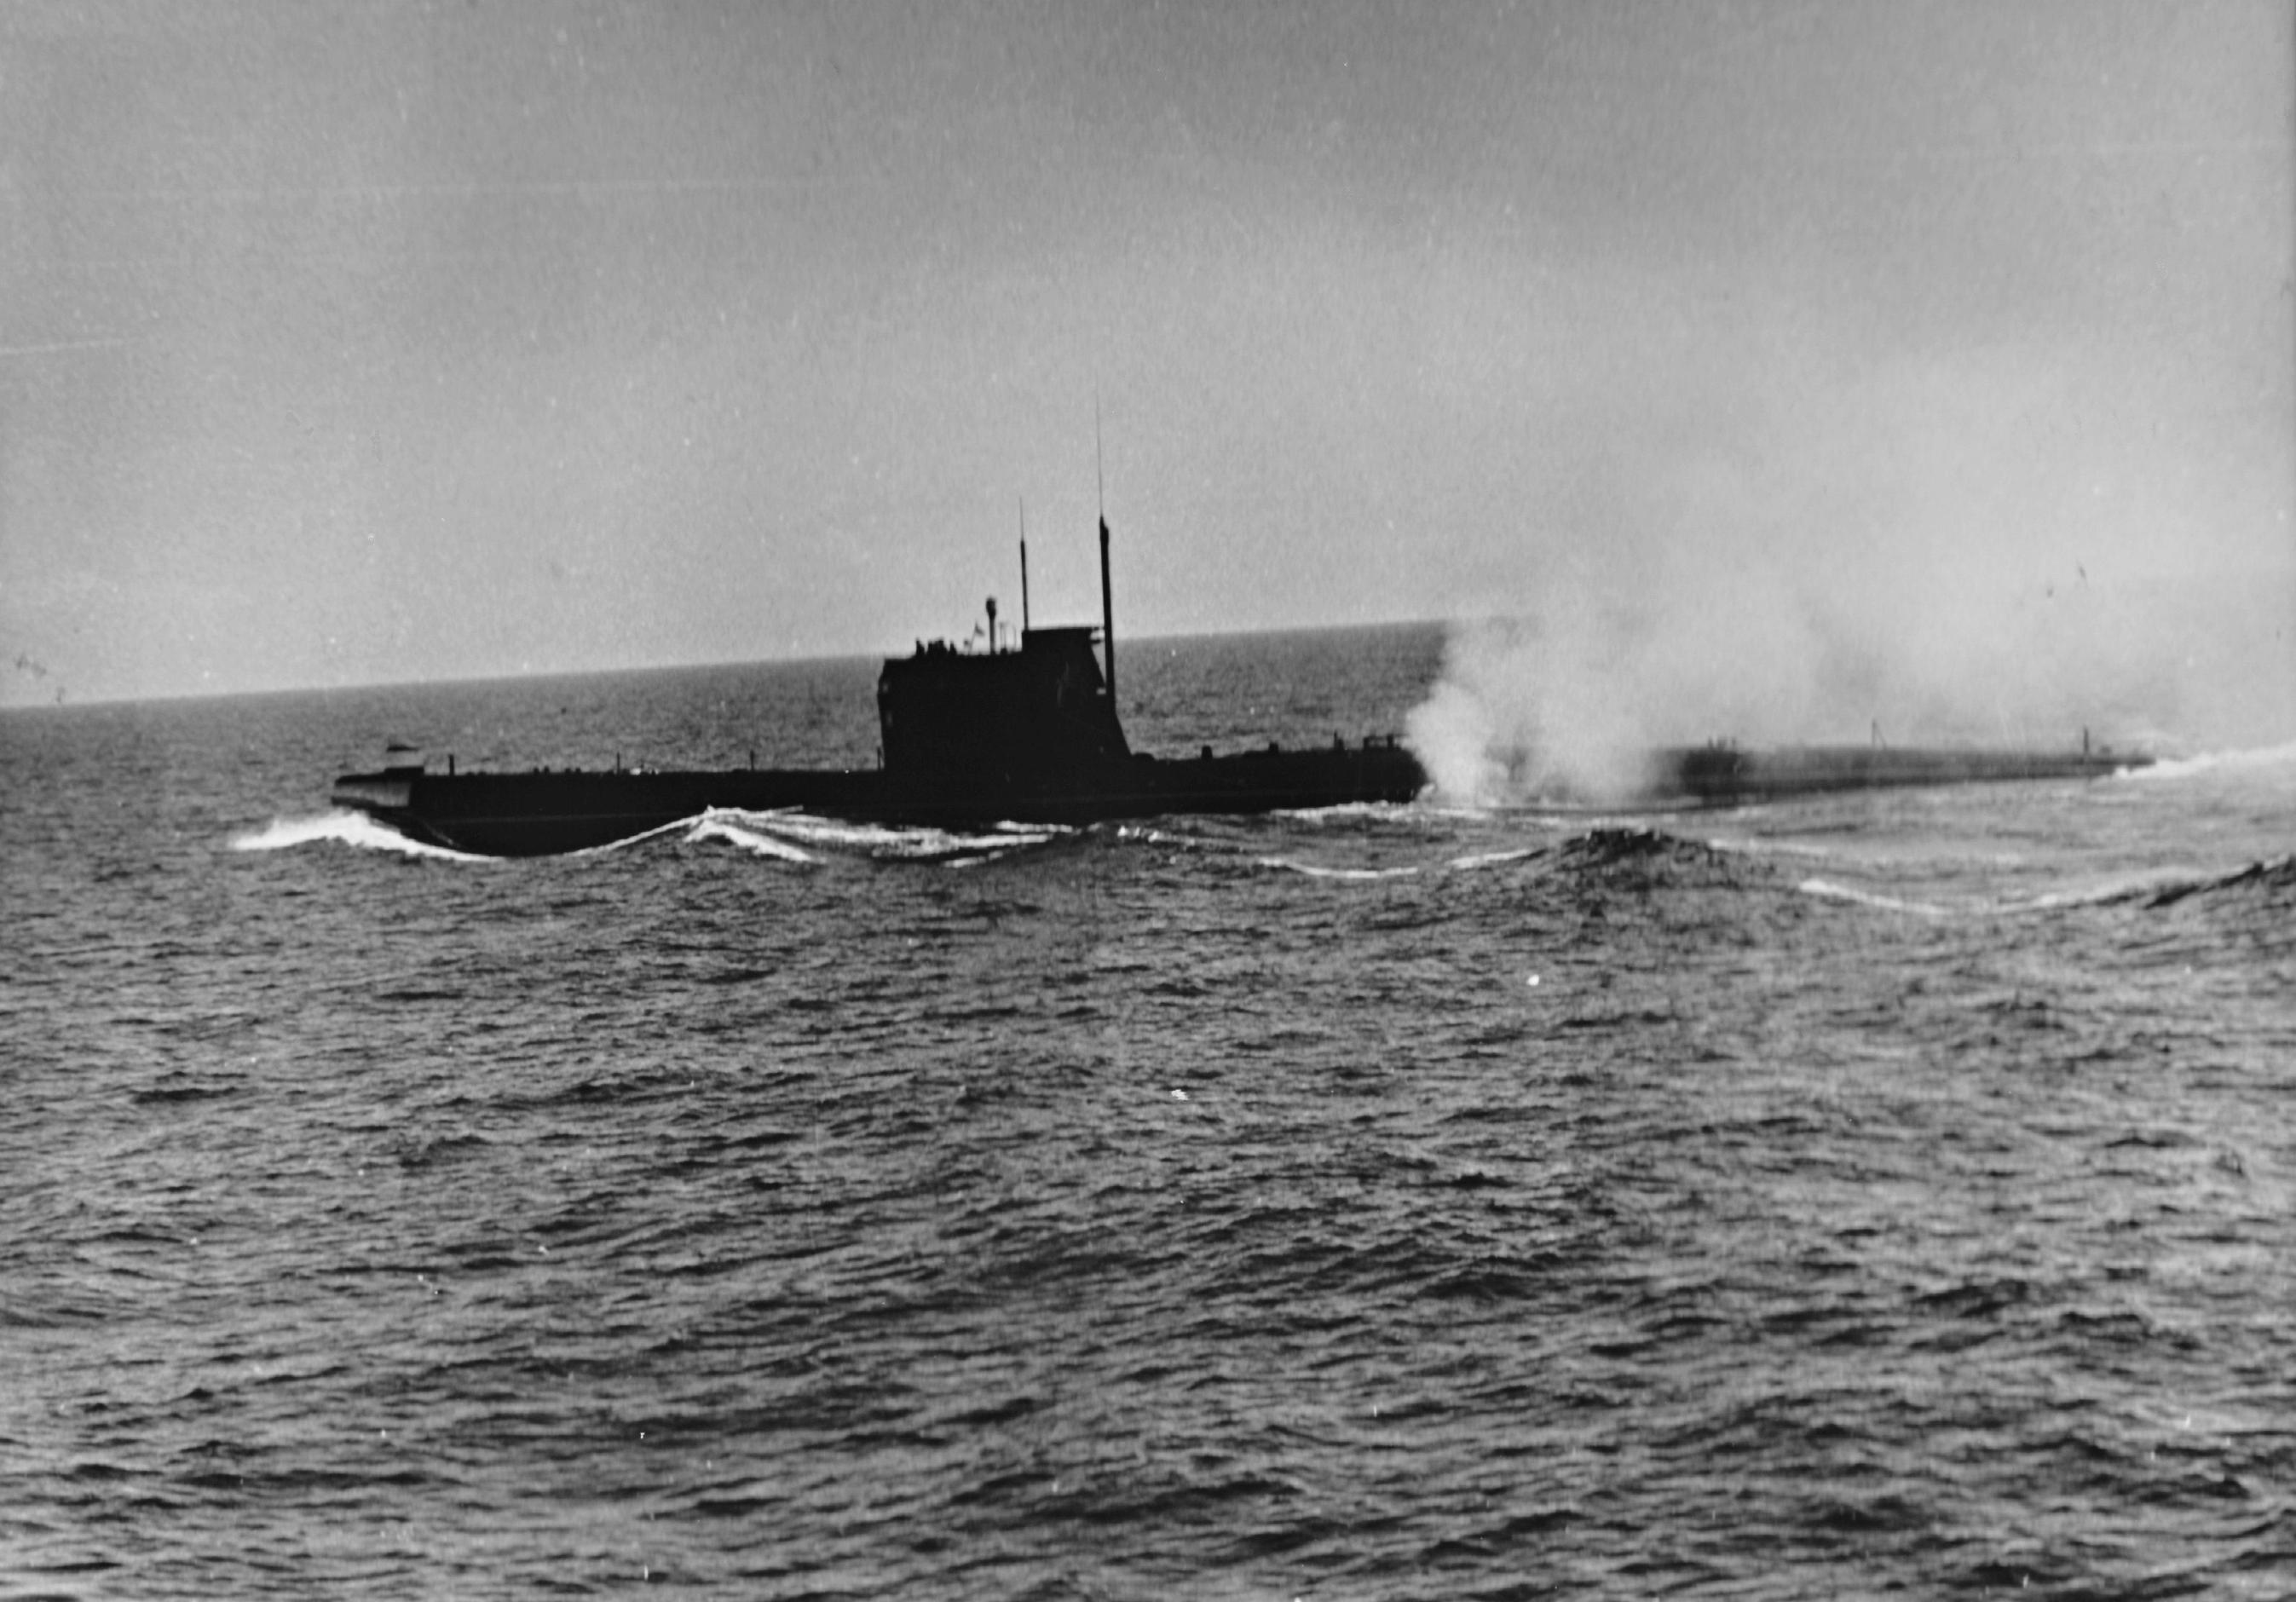 Фокстрот Б-641 в море.jpg